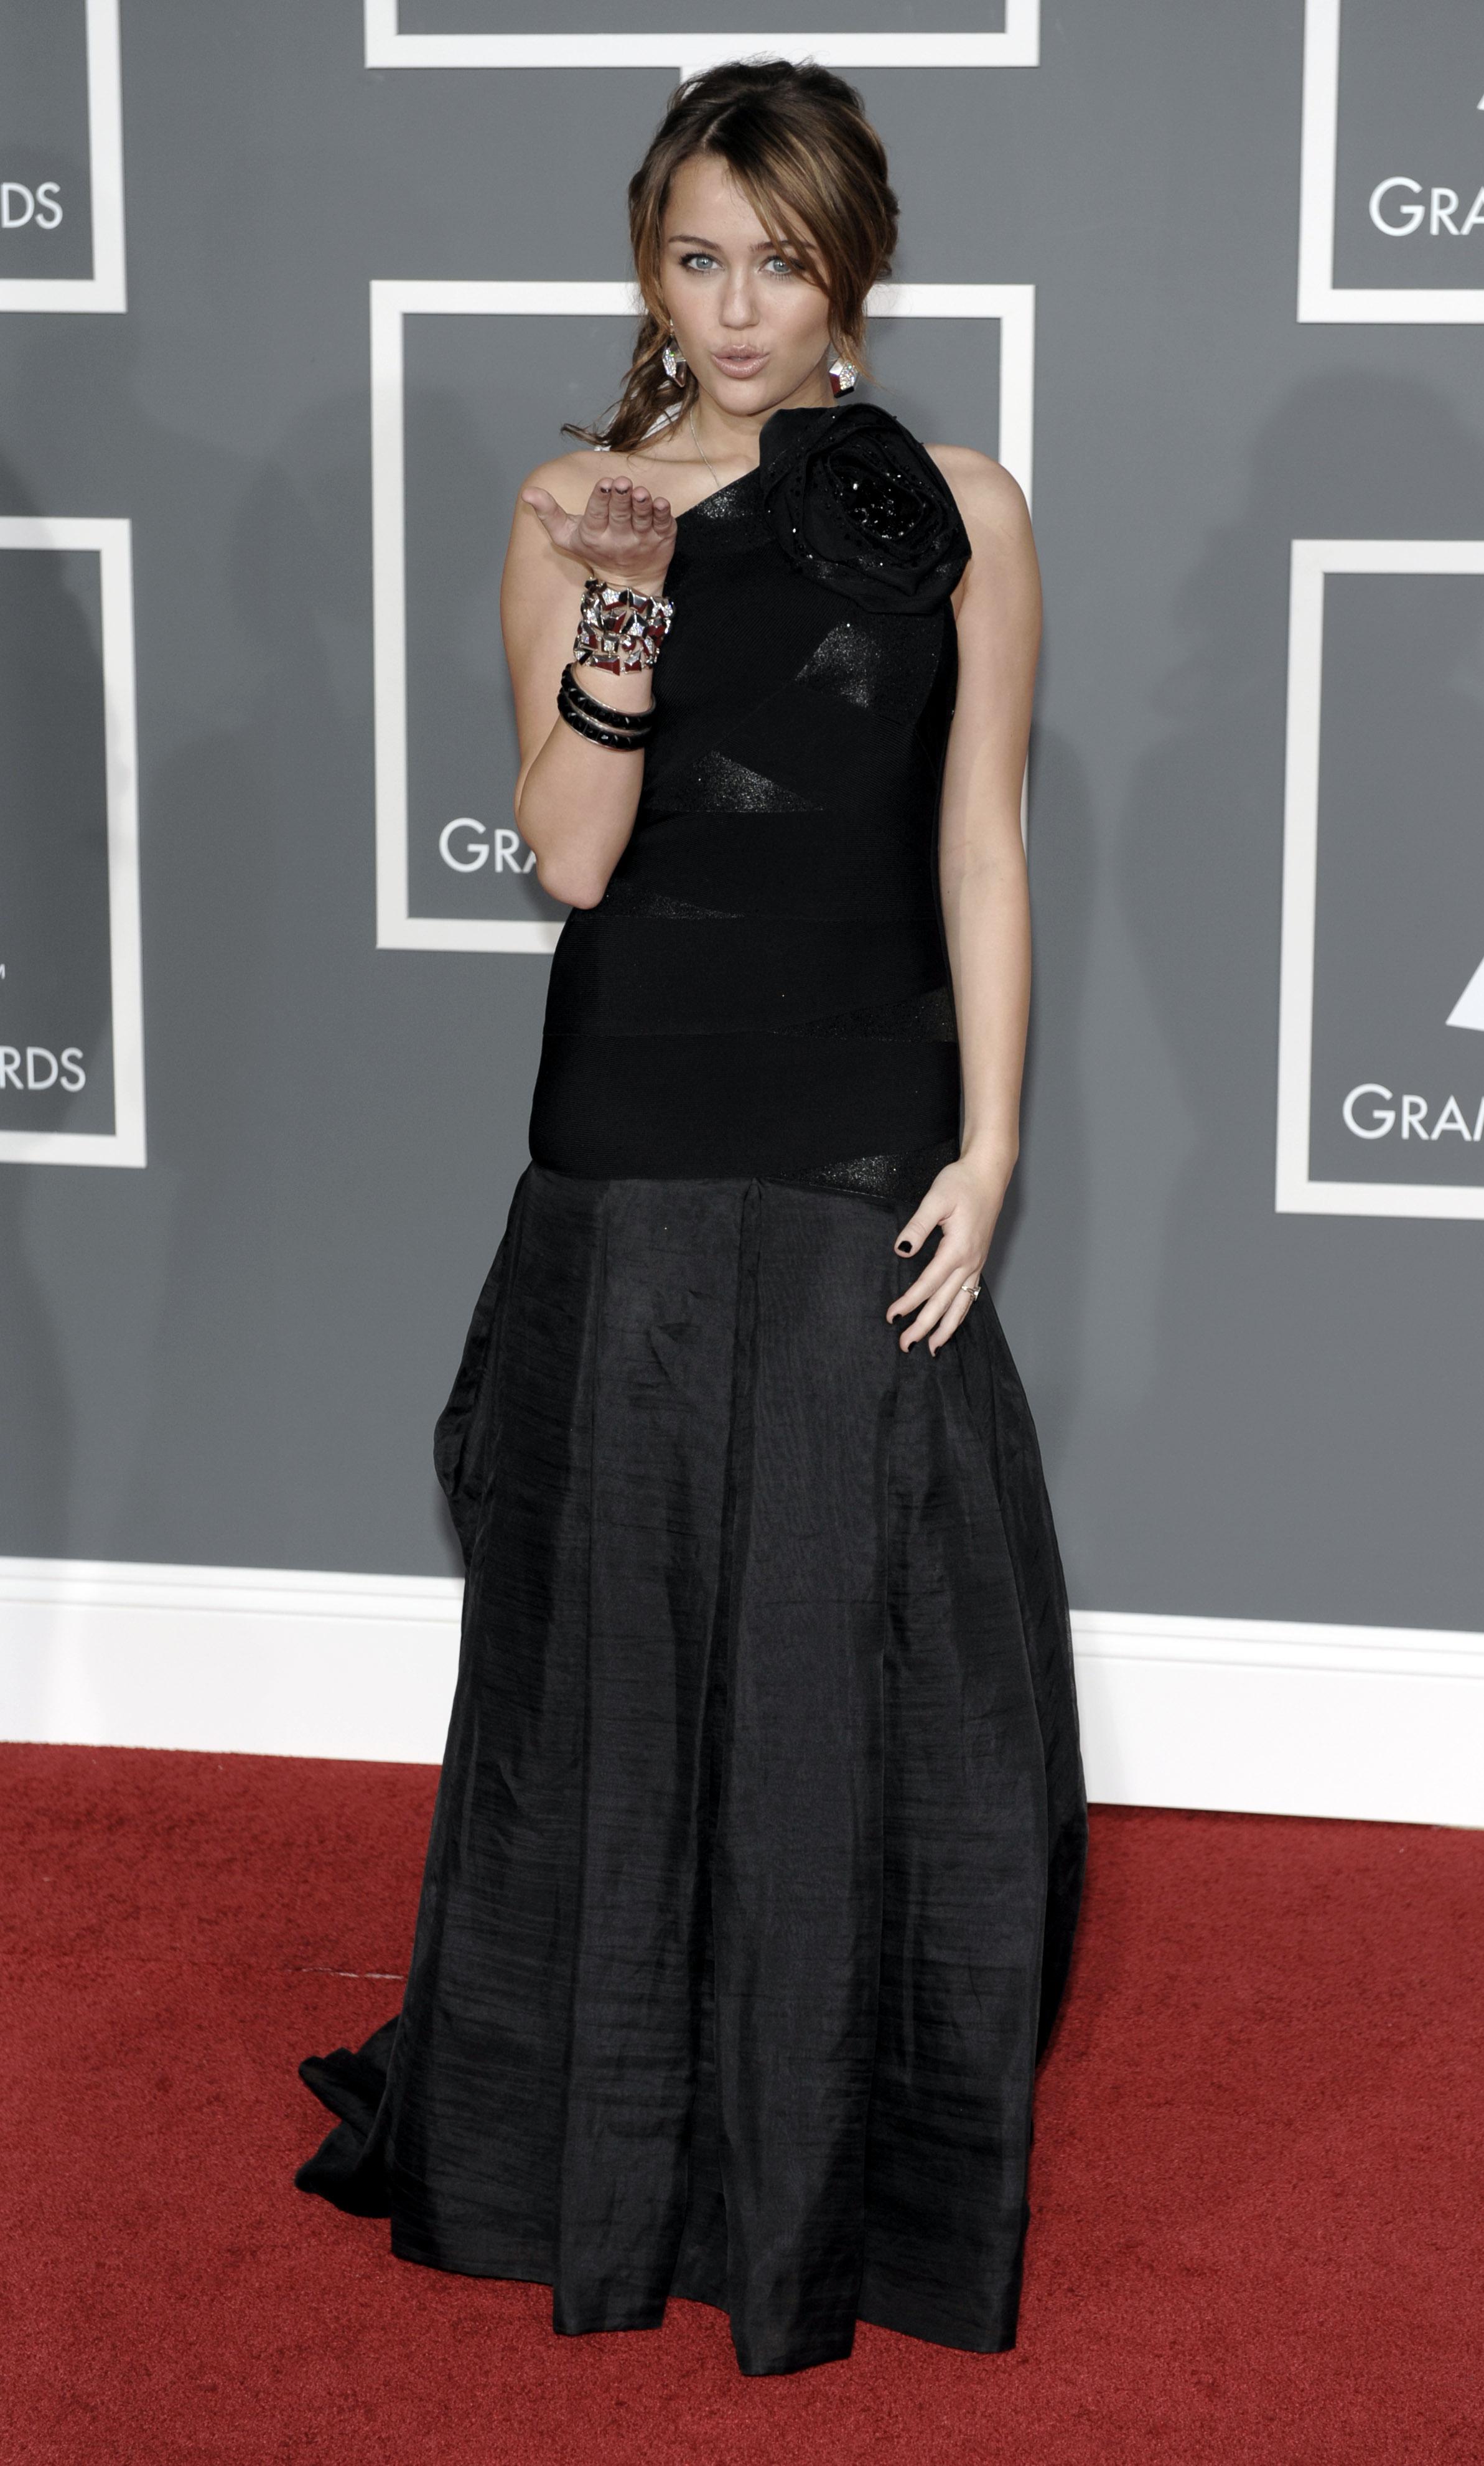 47543_Miley_Cyrus_celebutopia.net_435_122_1069lo.jpg